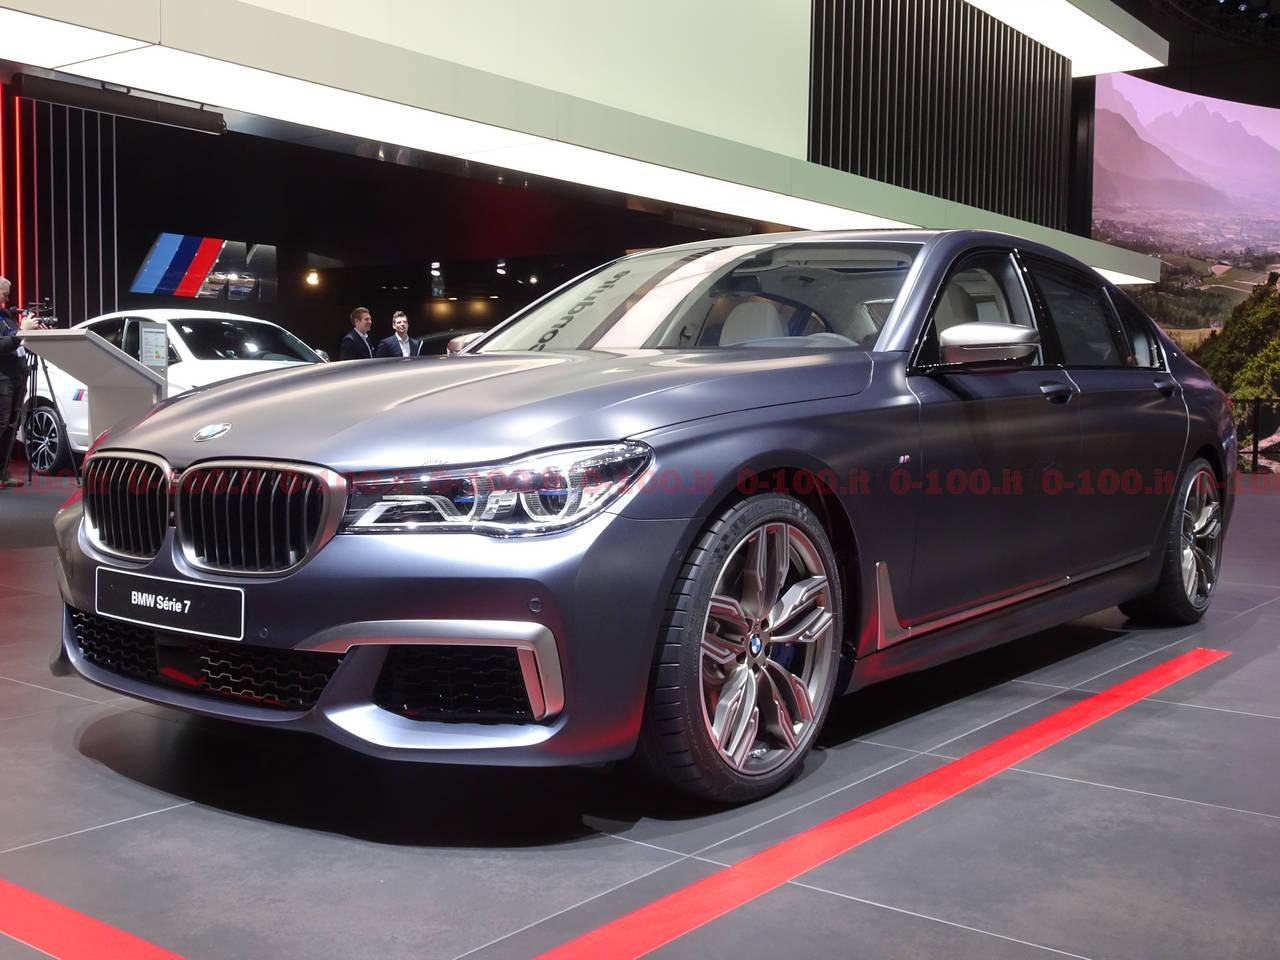 Ginevra-geneva-geneve-2017-BMW_Serie-7_0-100_11